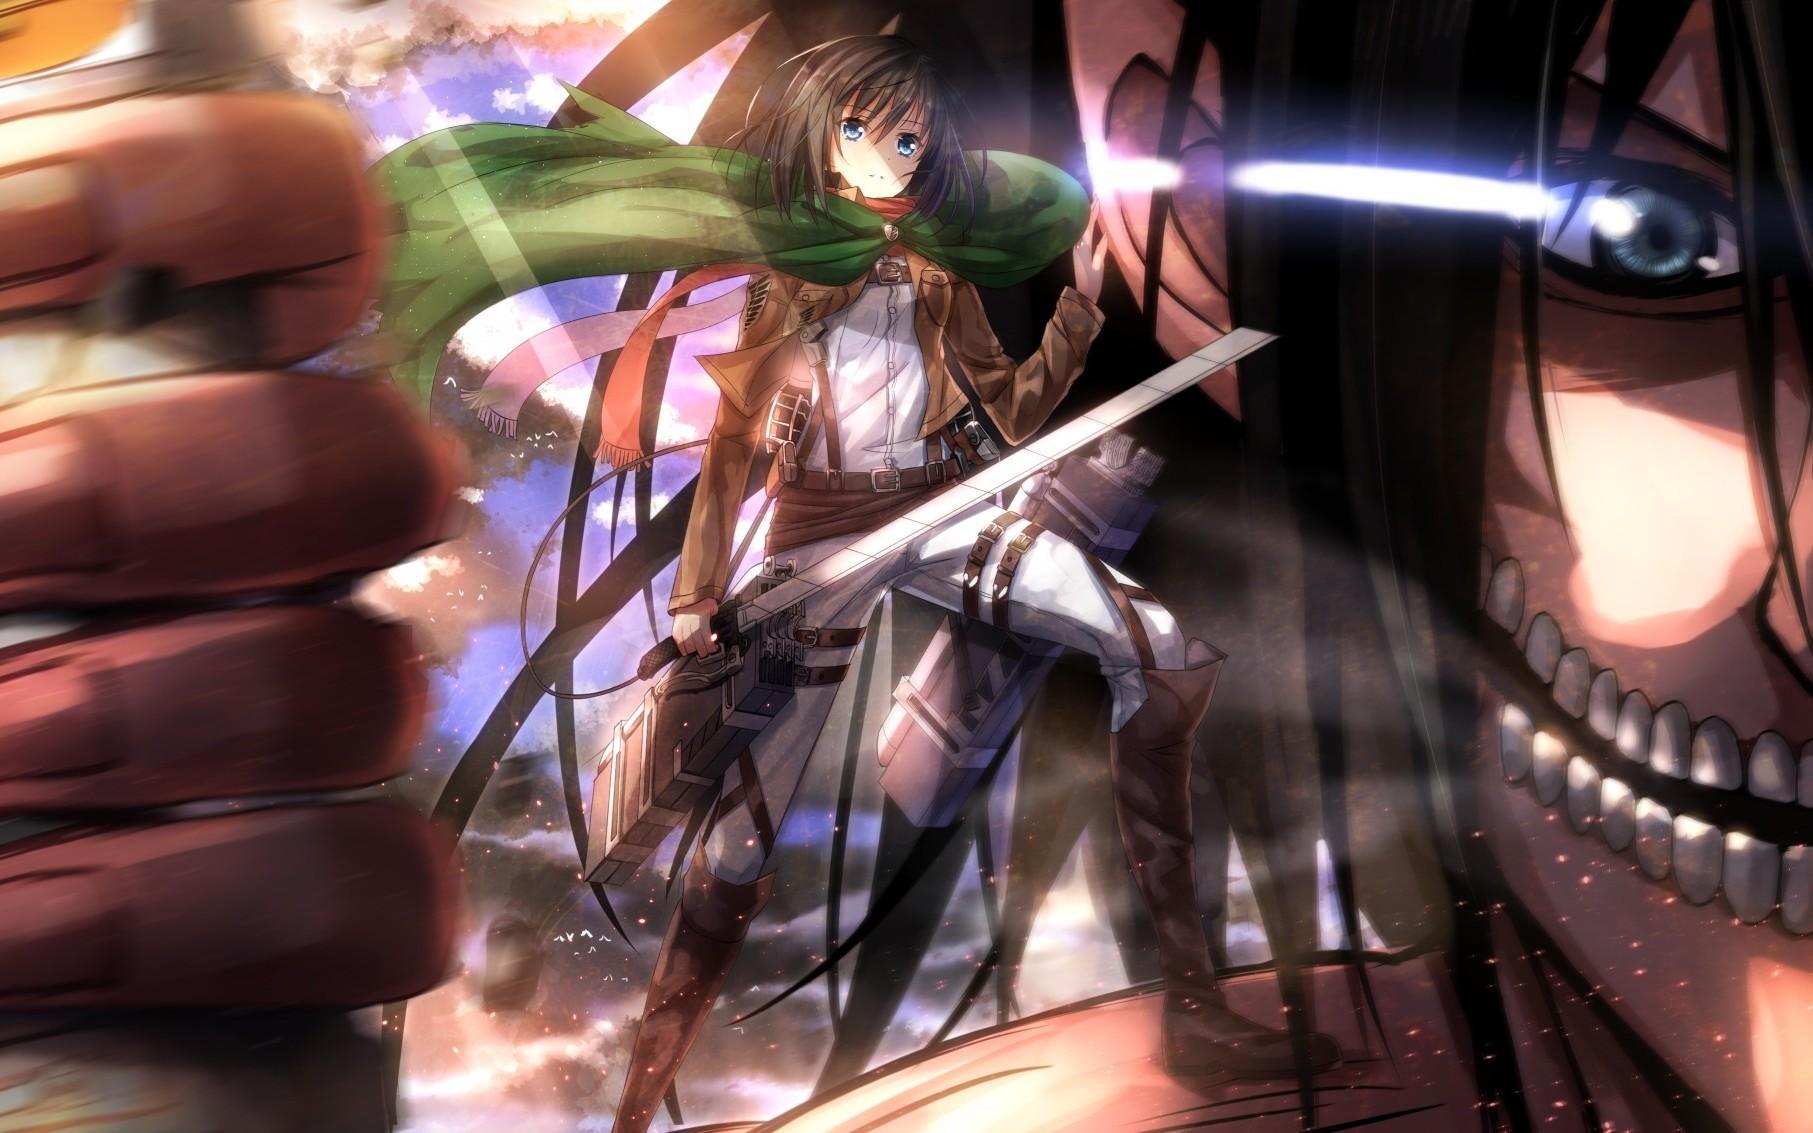 Wallpaper 1813x1133 Px Anime Girls Mikasa Ackerman Shingeki No Kyojin Swordsouls 1813x1133 Wallhaven 1014163 Hd Wallpapers Wallhere